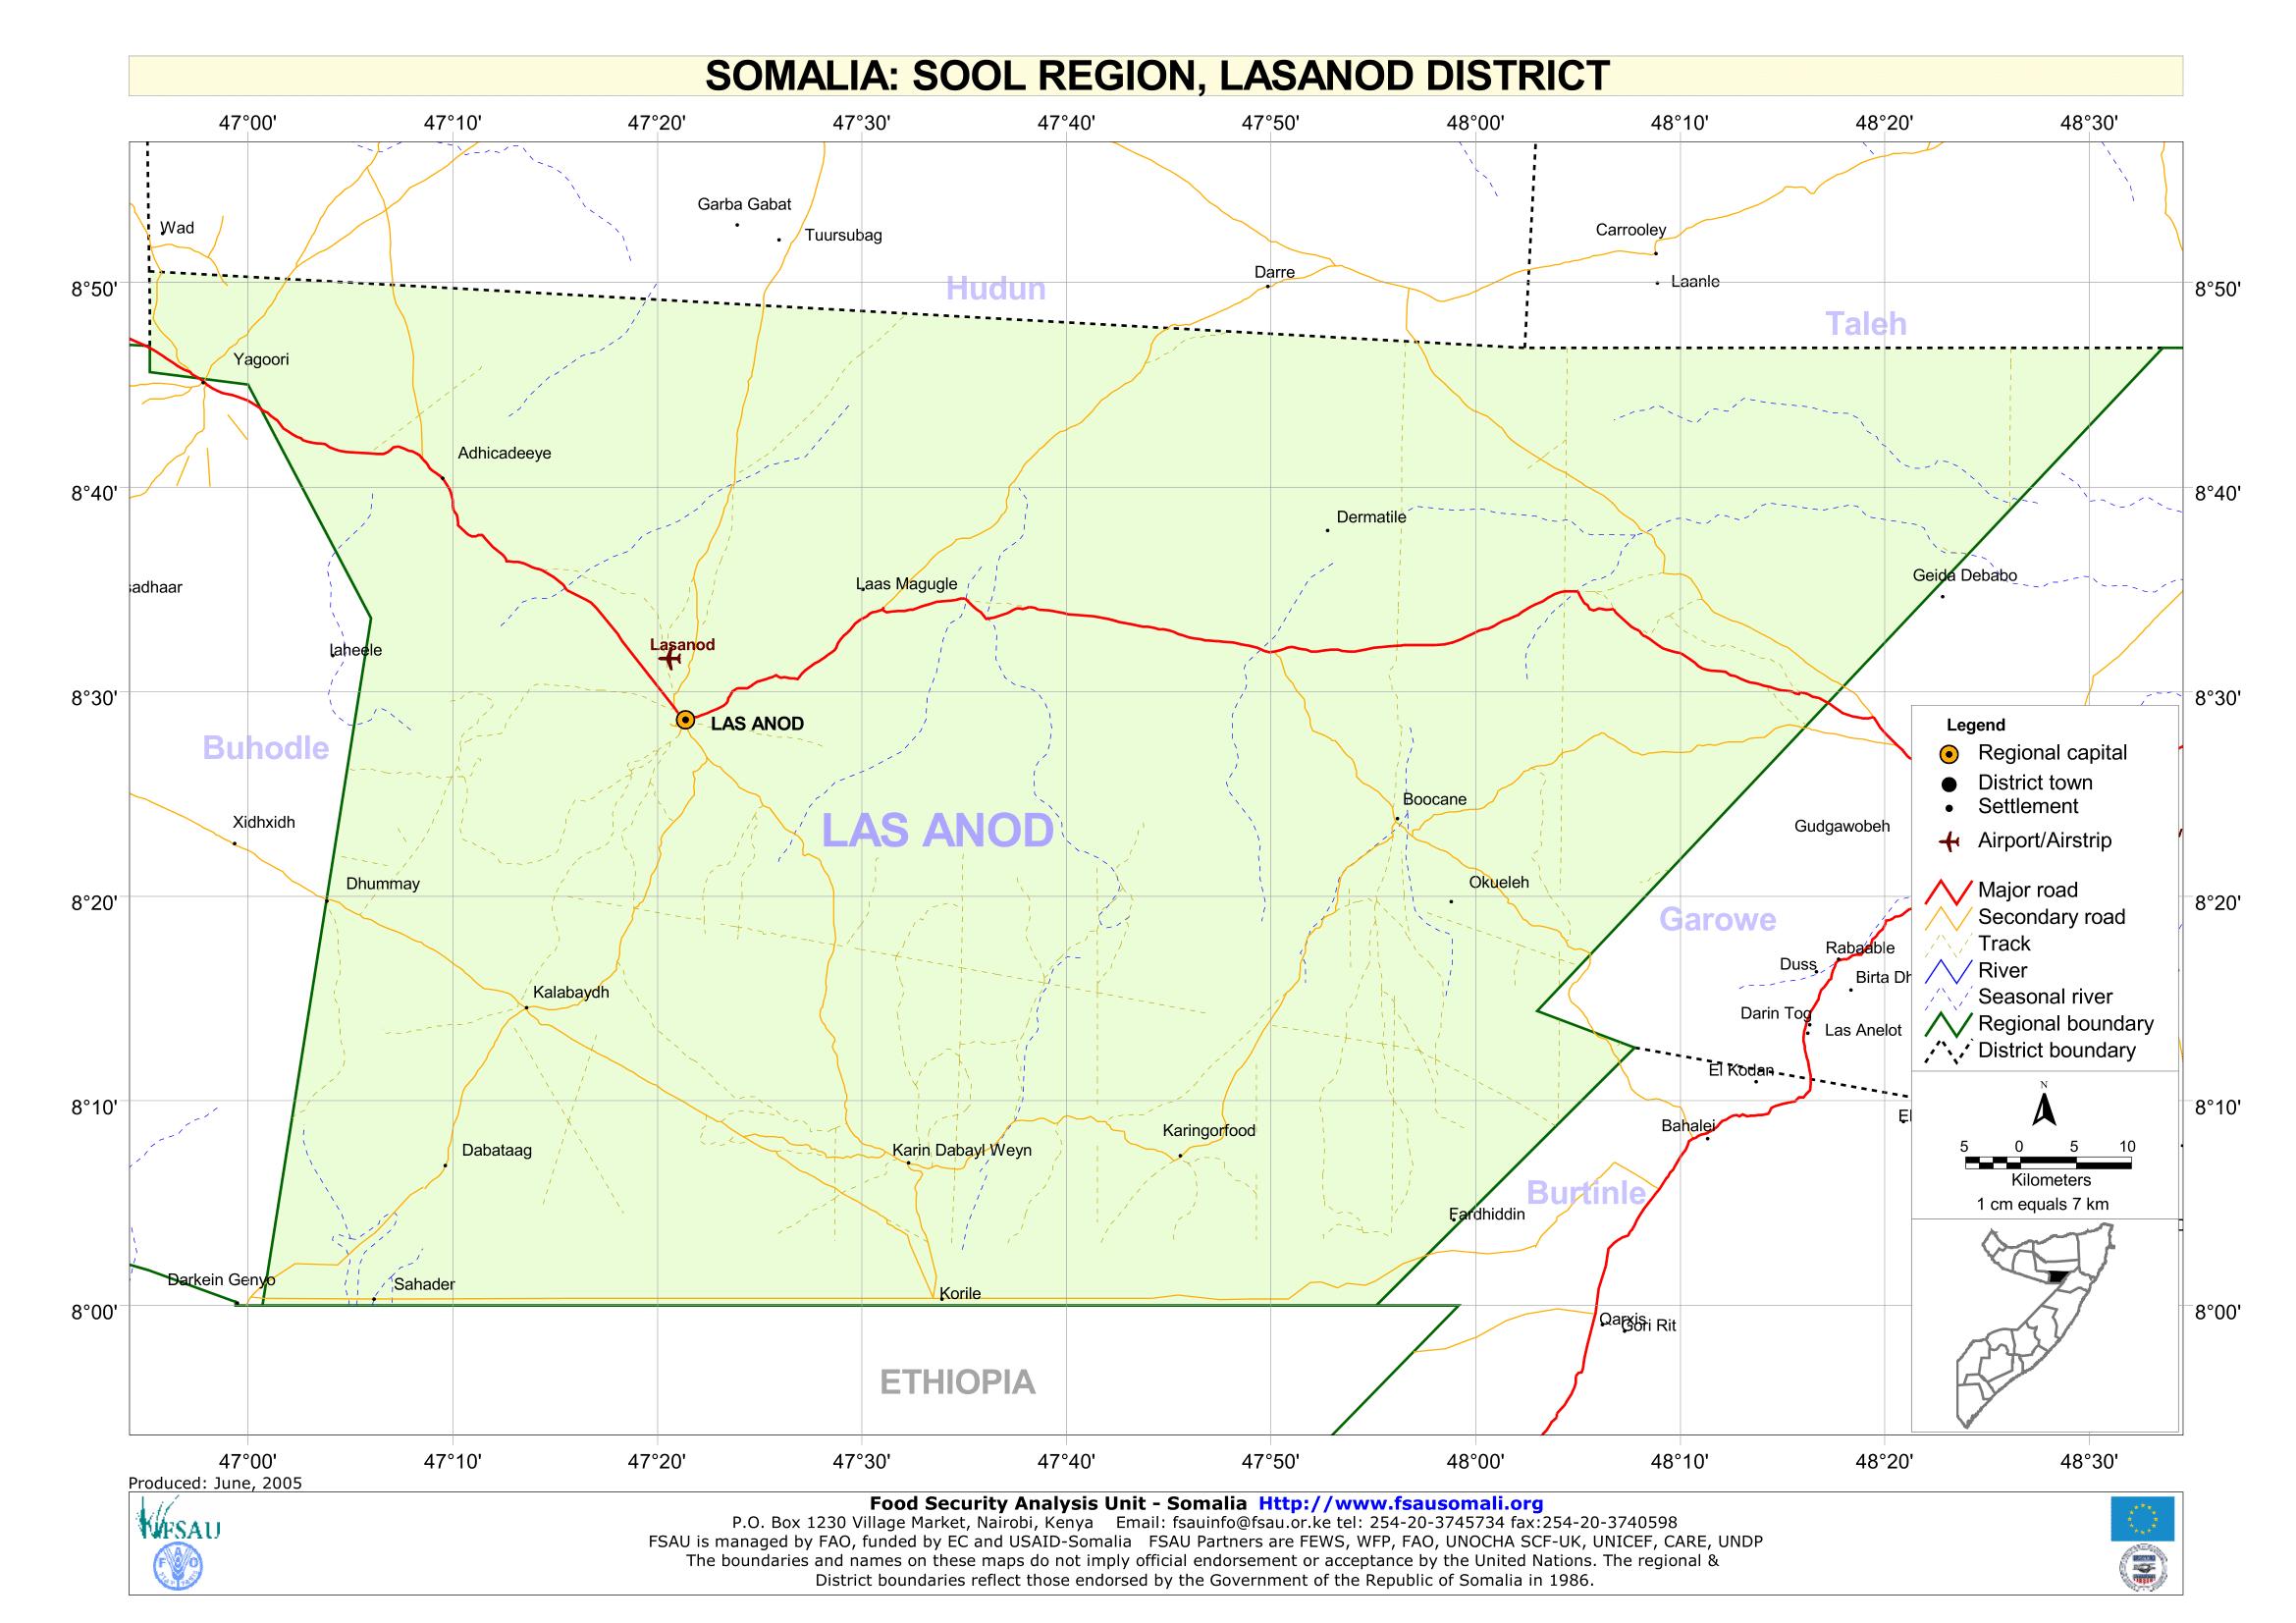 Somalia-Sool-Region-Las-anod-District-1.png